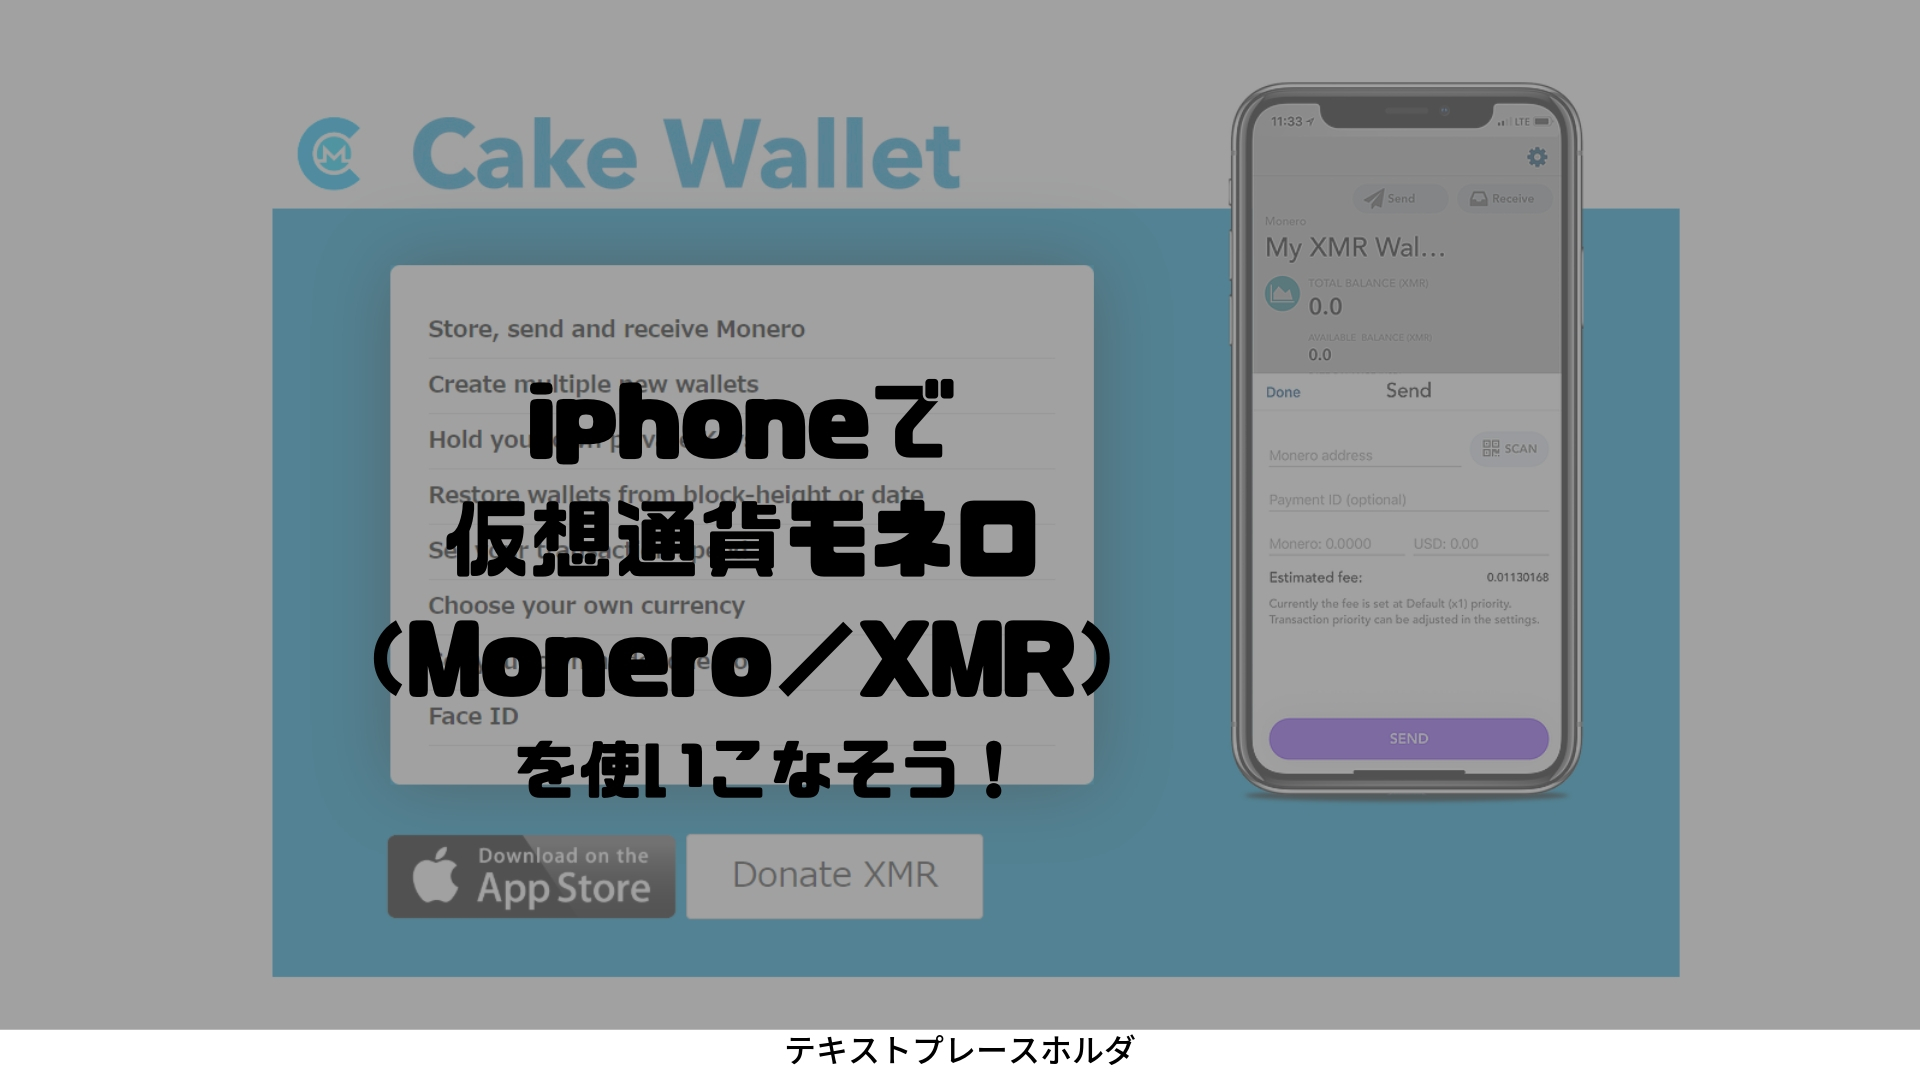 iphoneで 仮想通貨モネロ (Monero/XMR)